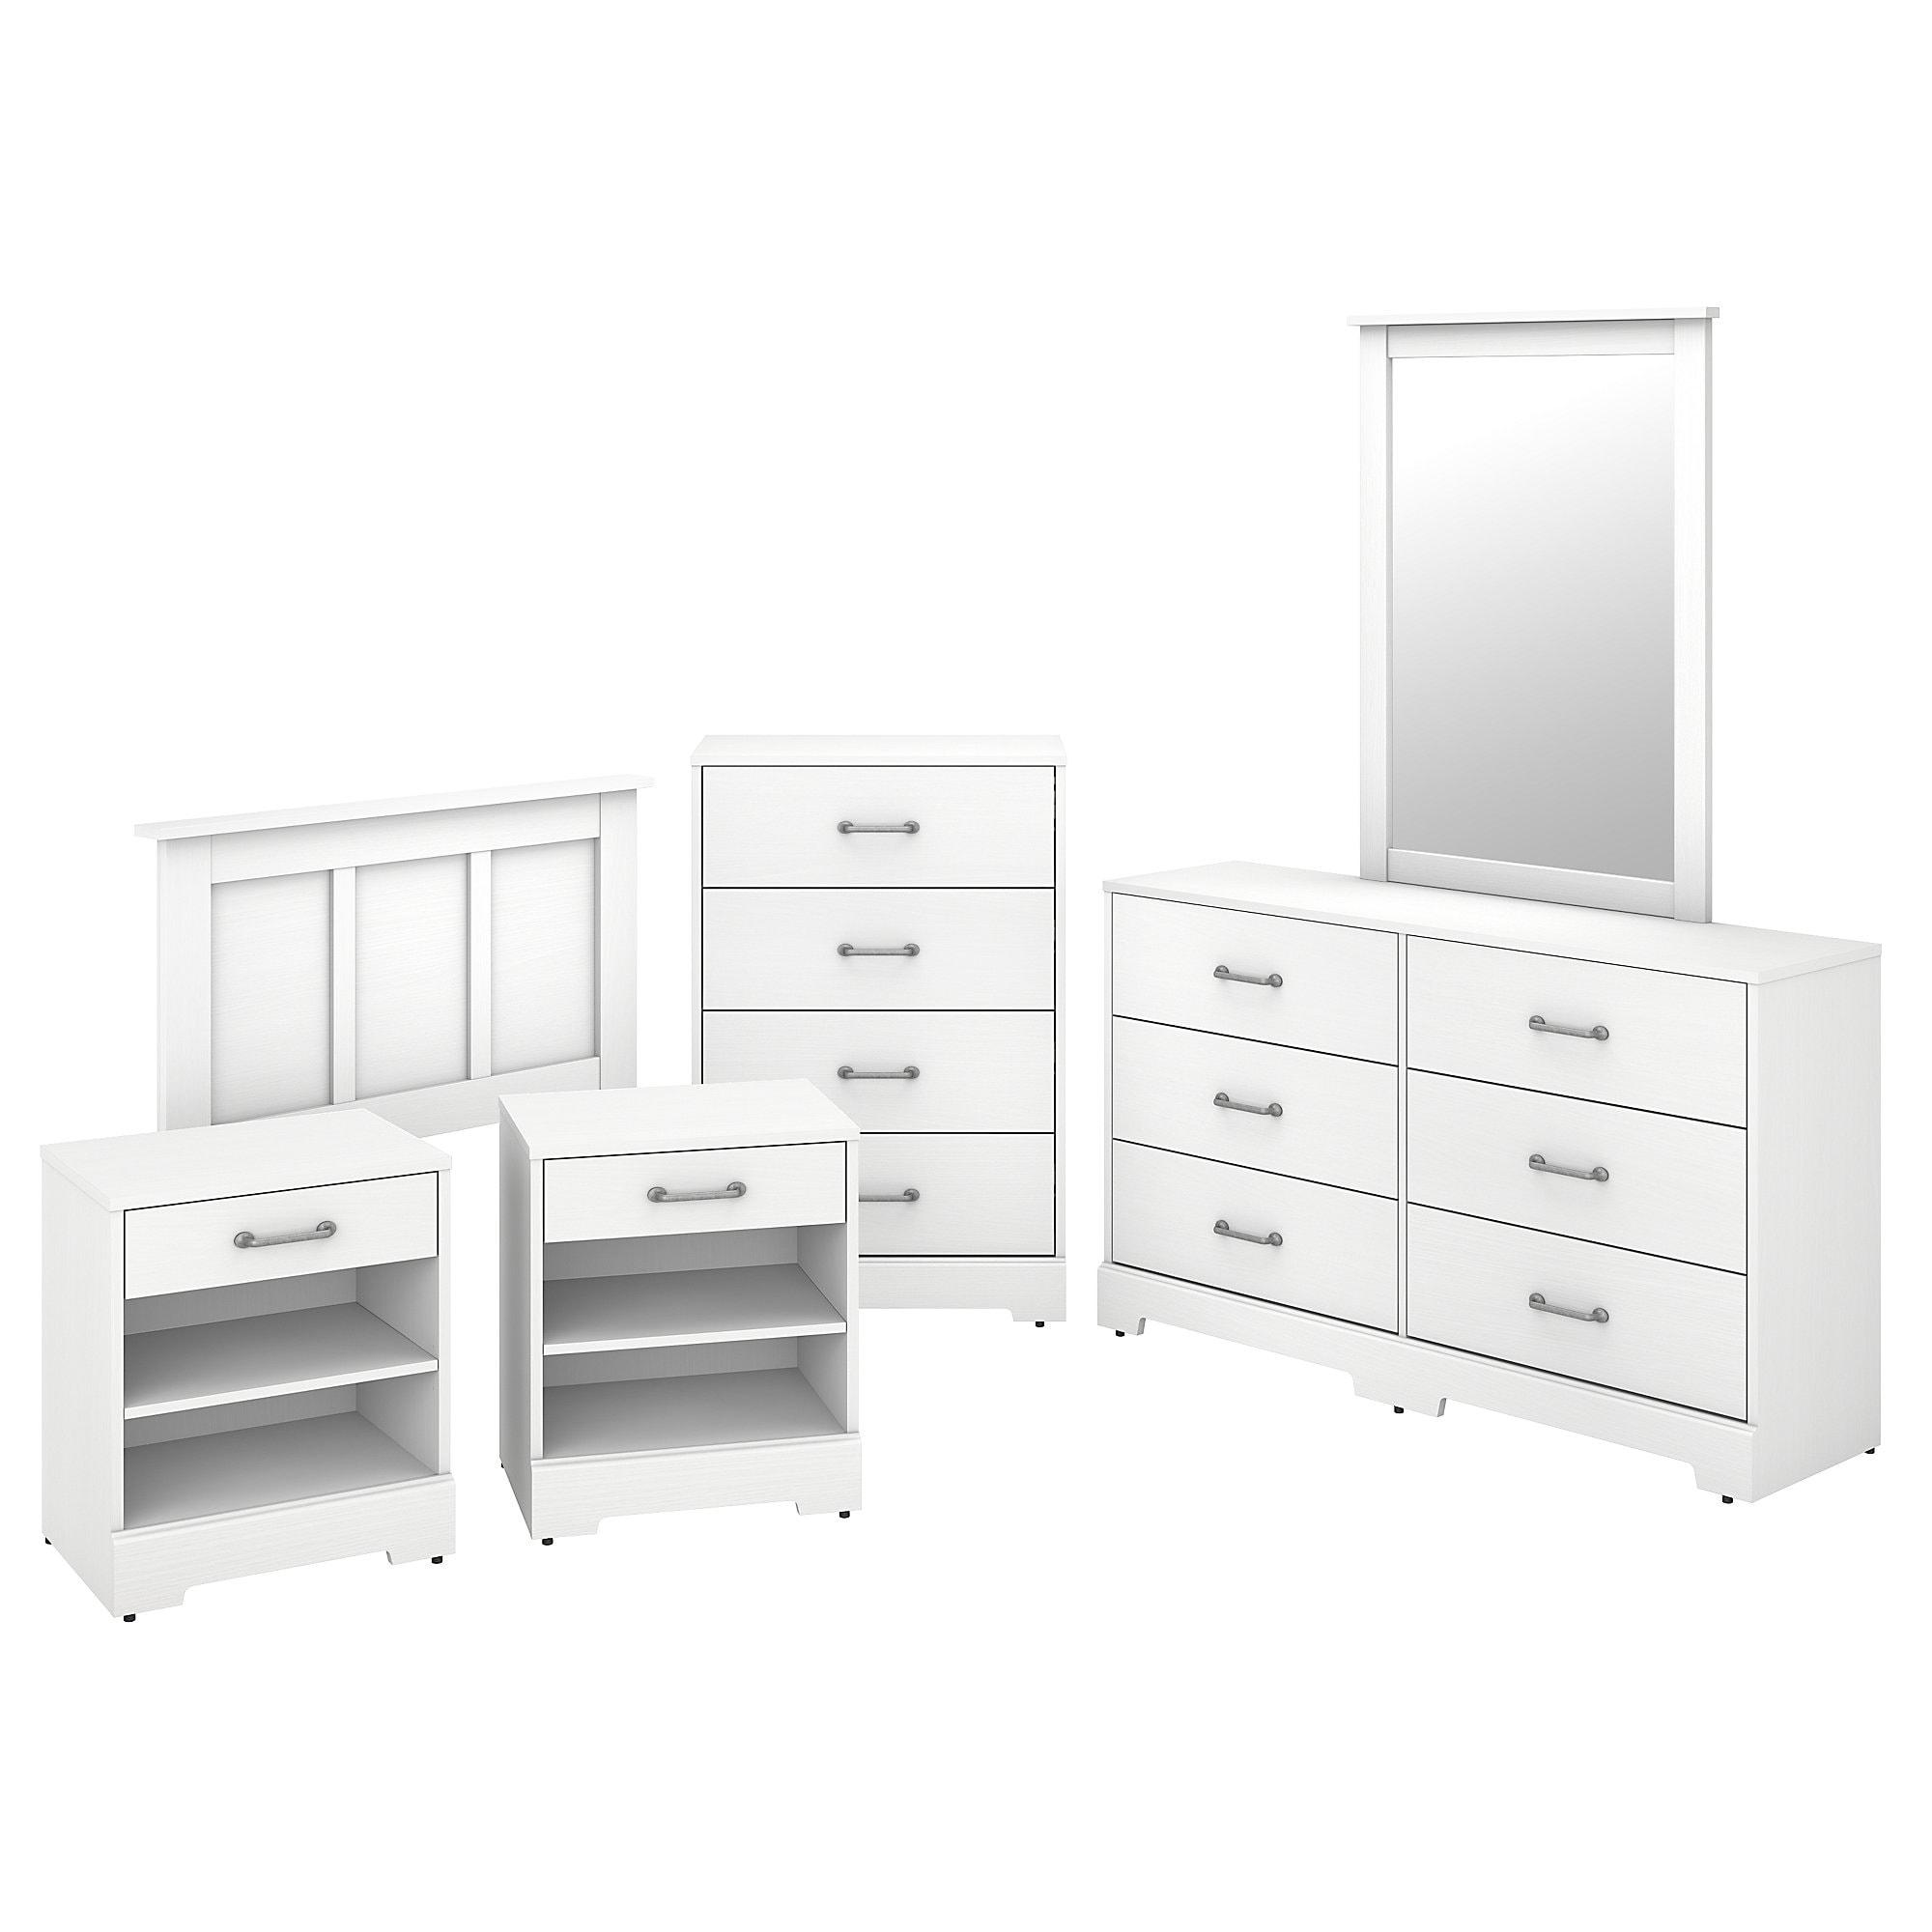 Bush Furniture Kathy Ireland Home River Brook 6 Piece Twin Size Bedroom Set Bedroom Sets Home Kitchen Sailingschool Pl